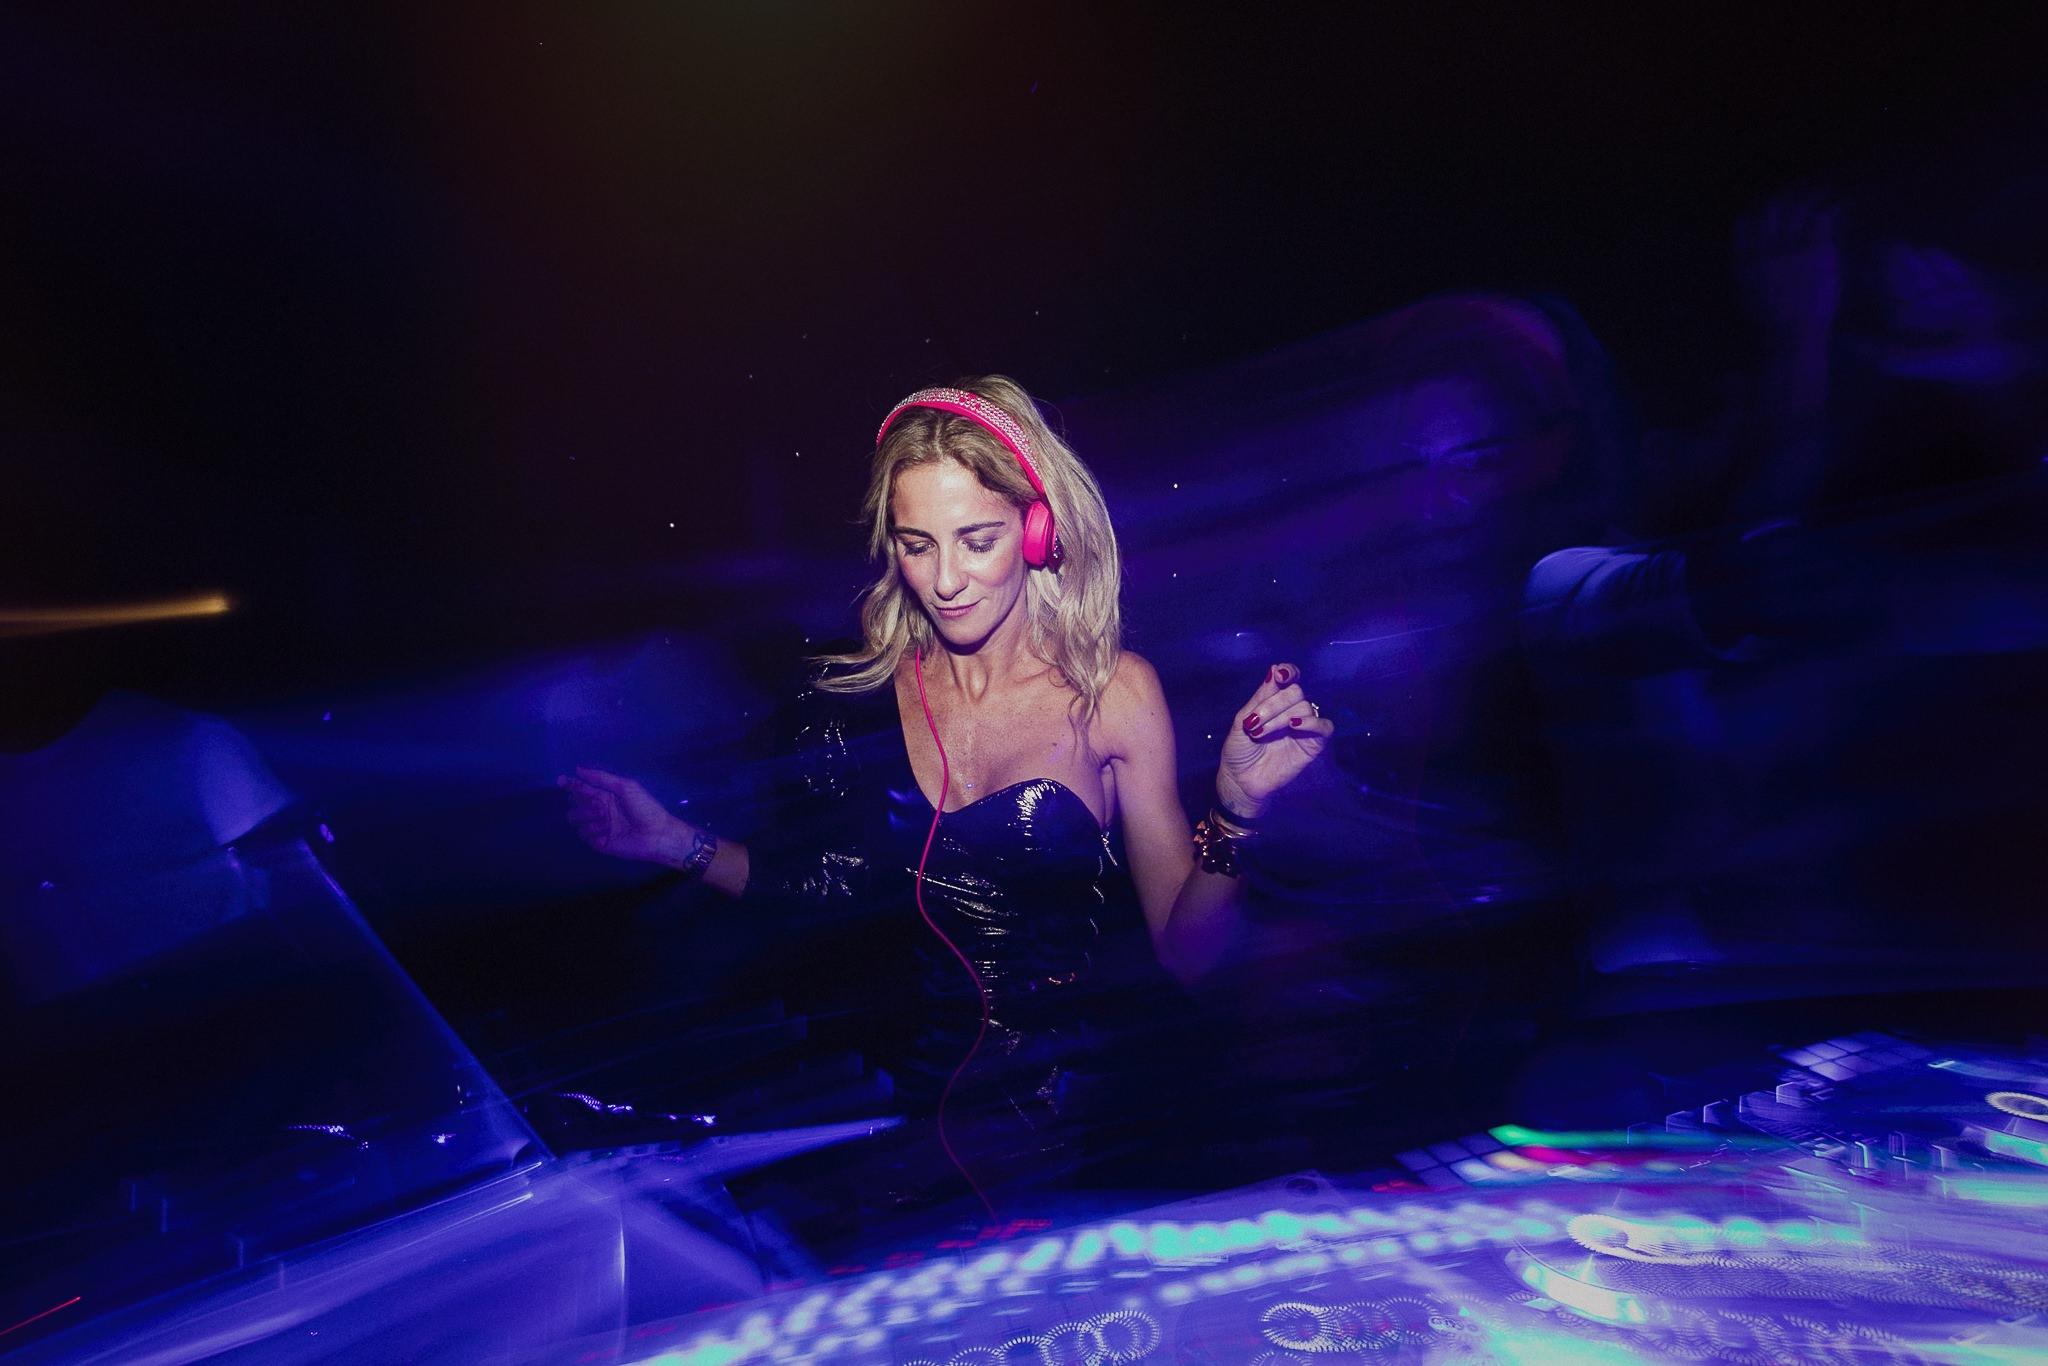 puli-demaria, DJ argentina